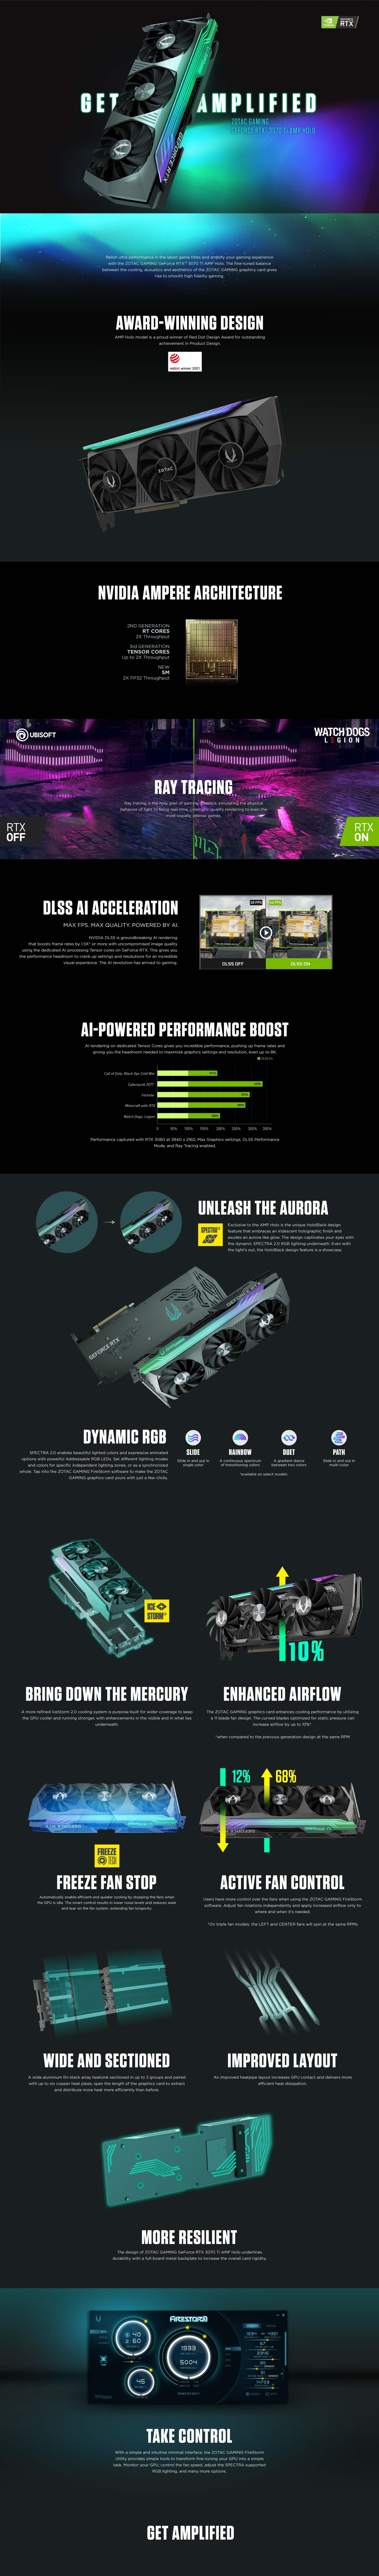 rtx 3070 ti amp holo overview english